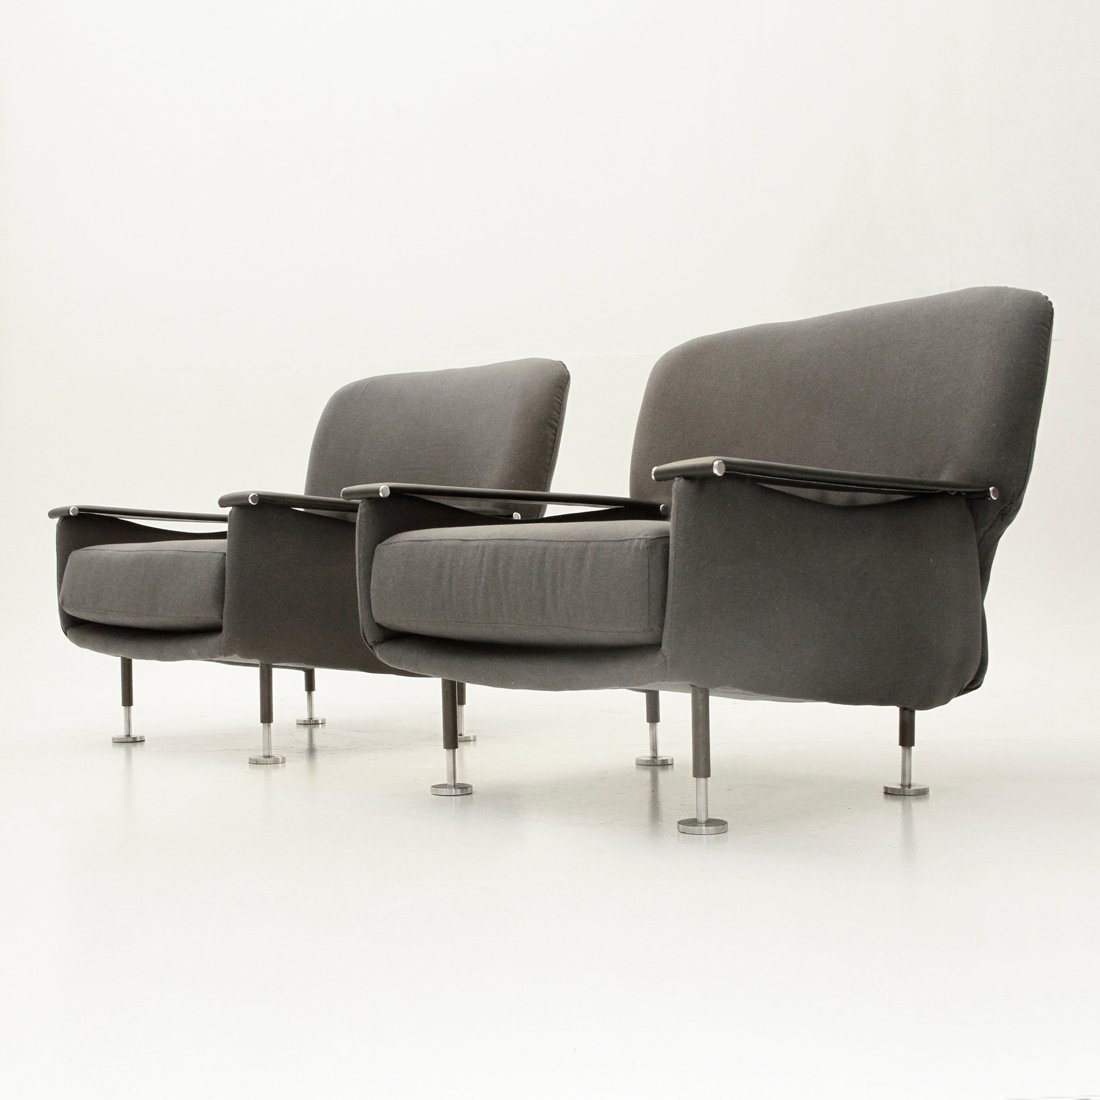 italienische graue armlehnst hle 1950er 2er set bei. Black Bedroom Furniture Sets. Home Design Ideas